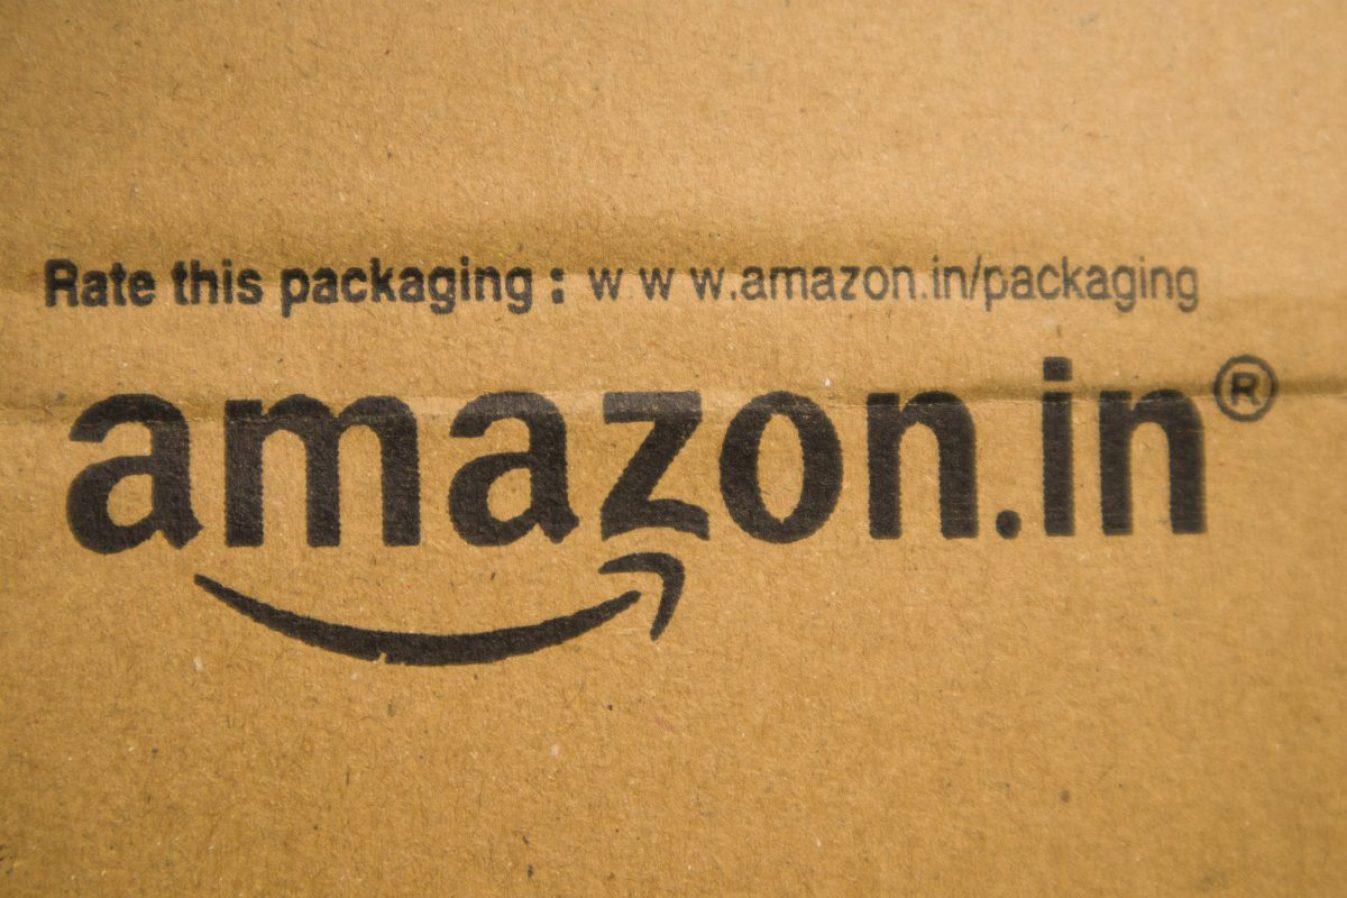 BANGALORE INDIA June 13, 2019 : Amazon in printed on cardboard in India. Image credit: Lakshmiprasad Sindhnur / 123rf